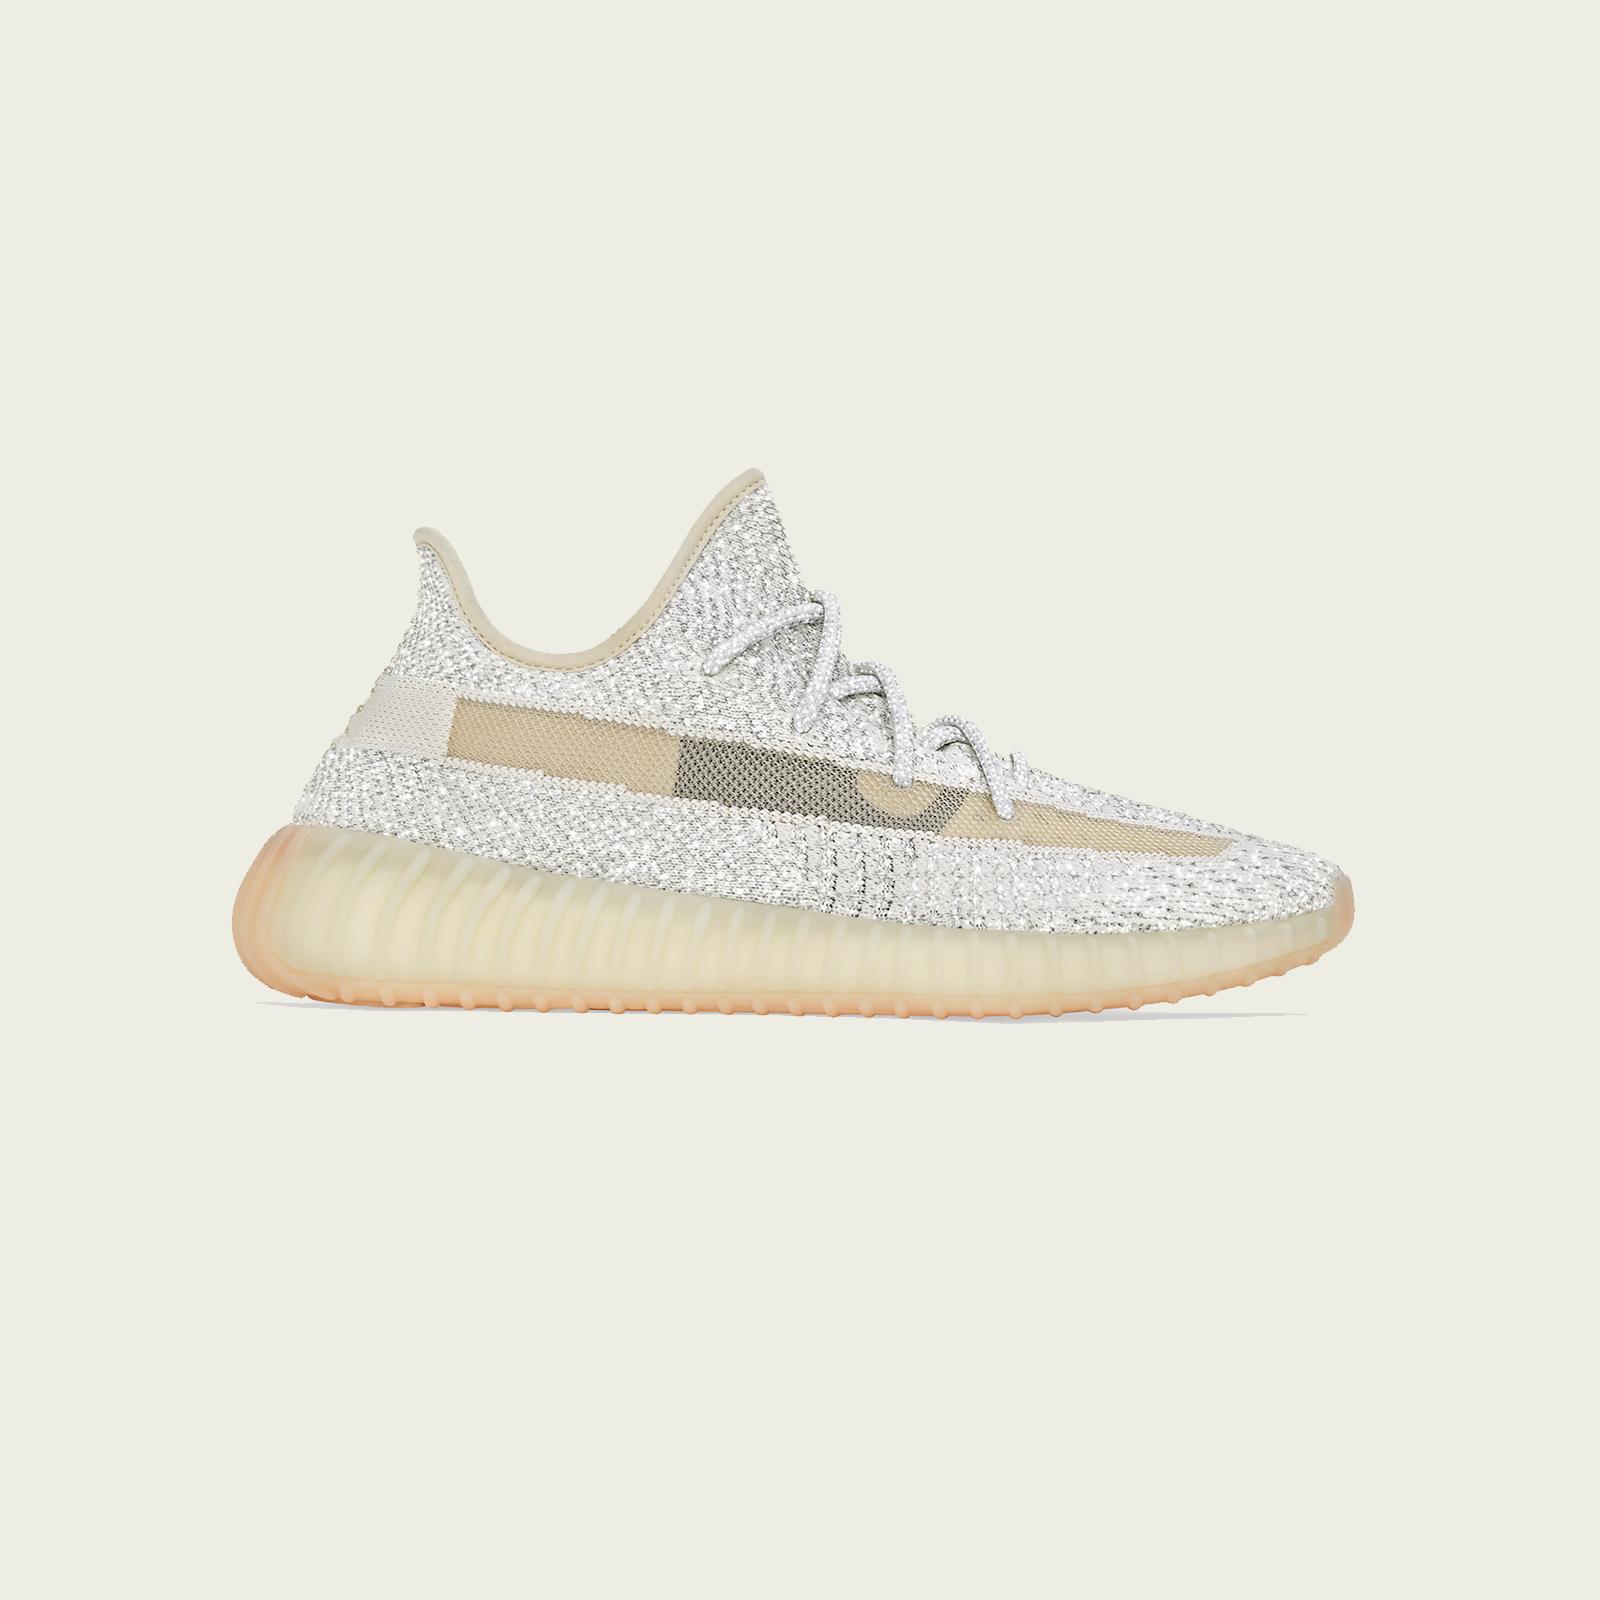 01-adidas-yeezy-boost-350-v2-lundmark-reflective-fv3254